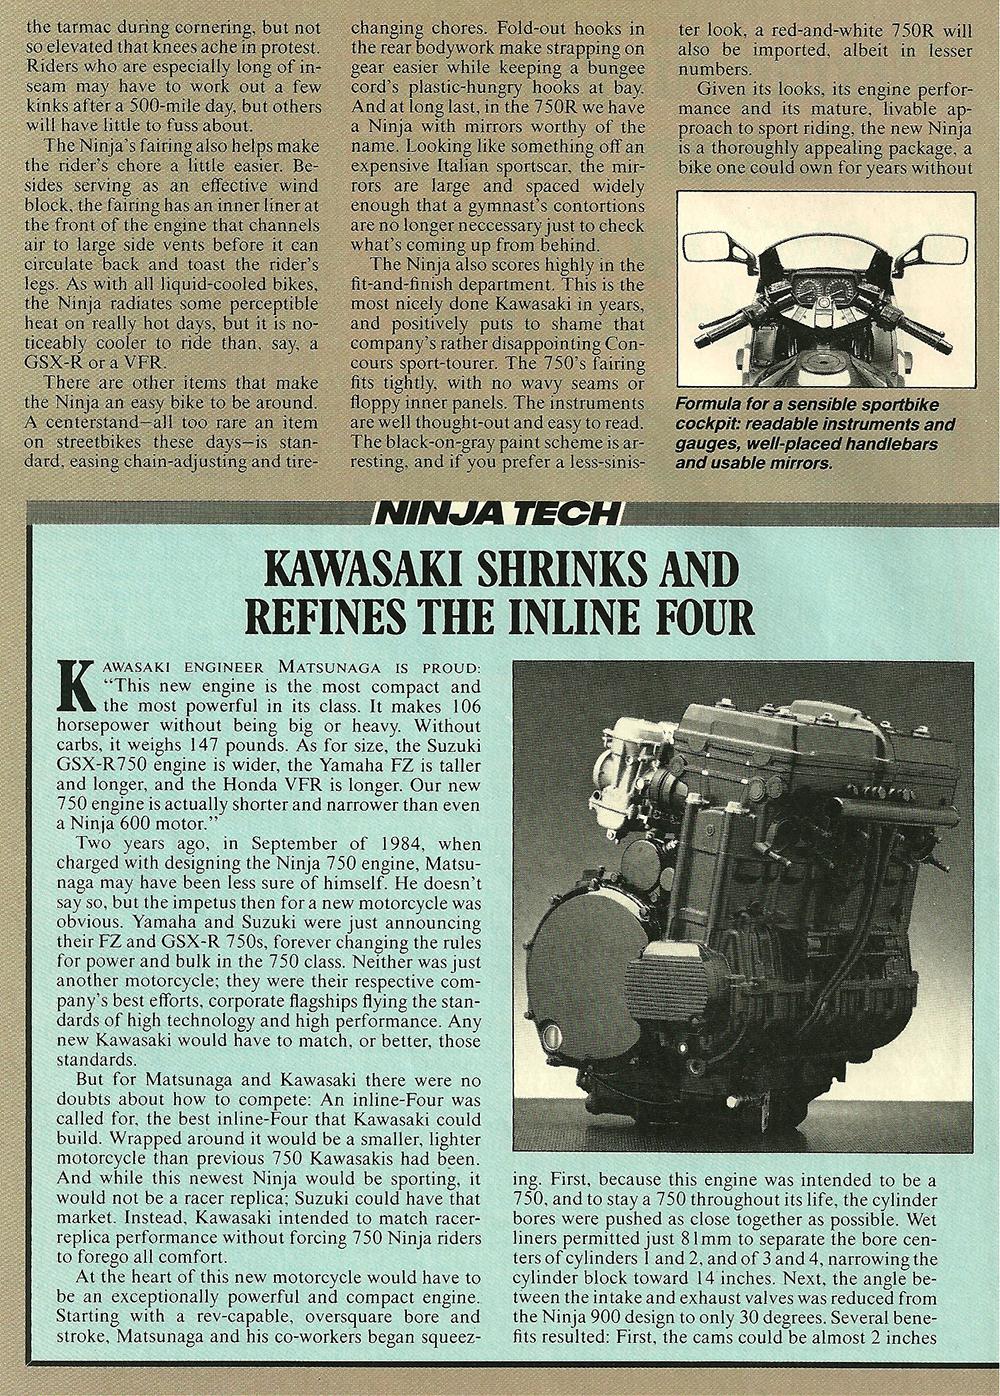 1986 Kawasaki Ninja 750R road test 03.jpg